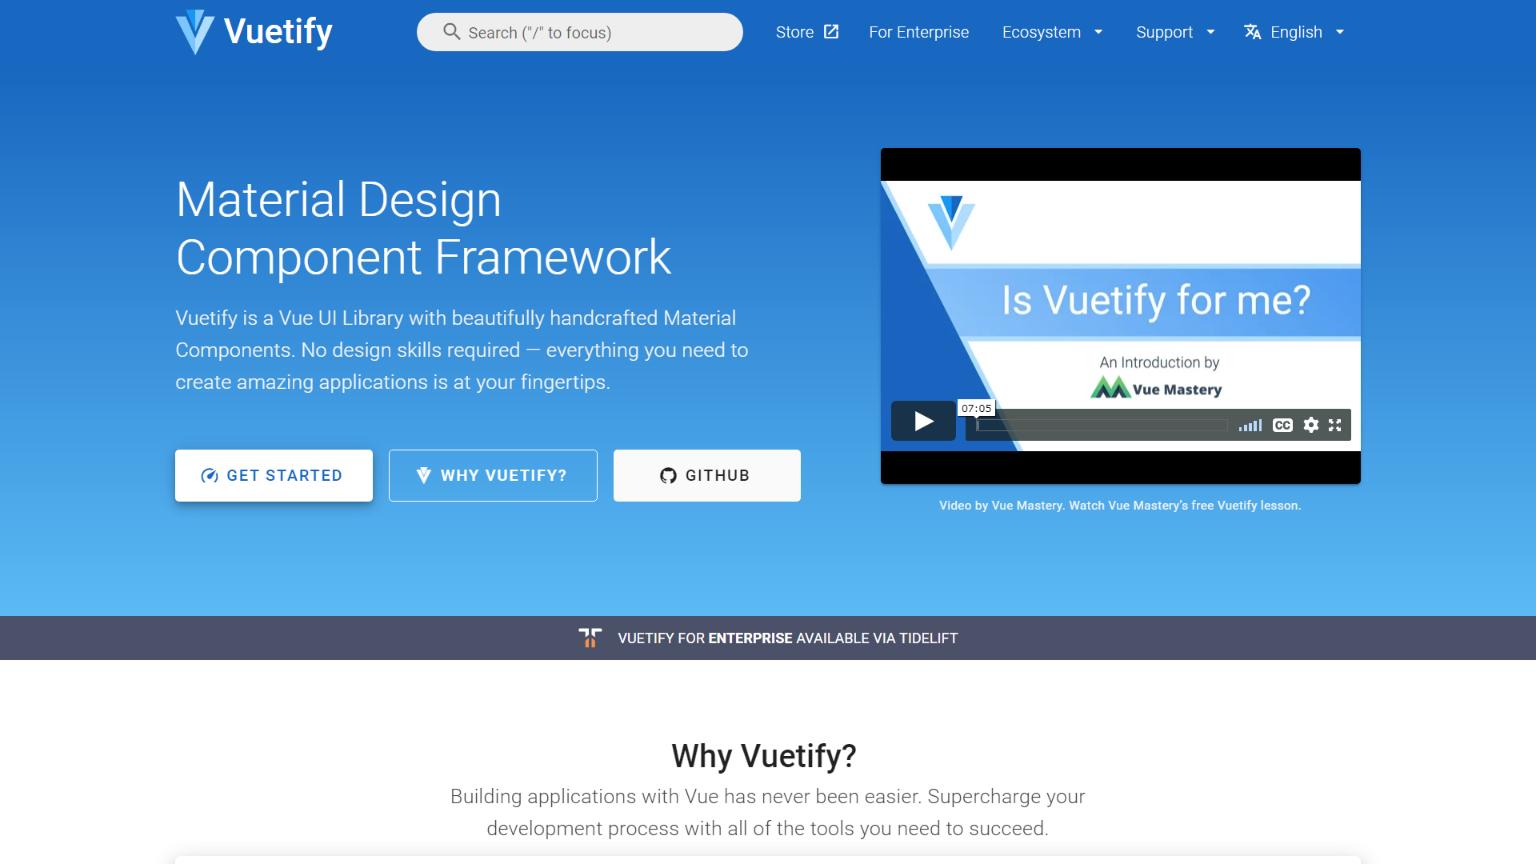 Vuetify VueJS UI Component Libraries